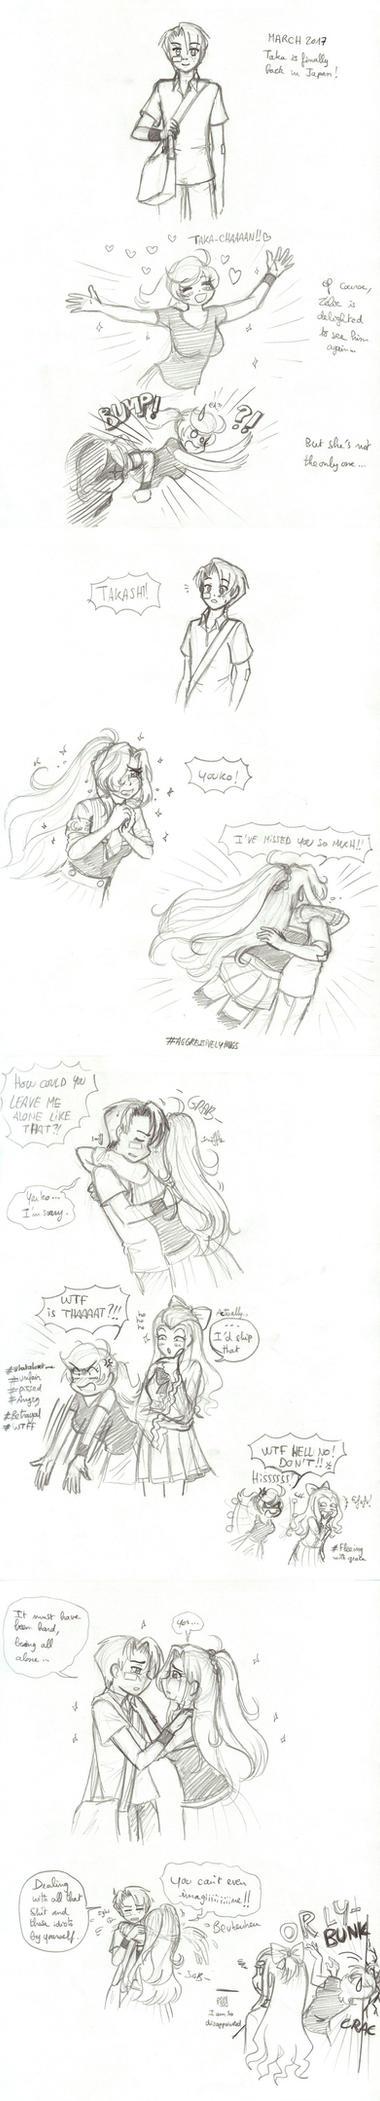 MSRA: [P] Taka's return? by ValKrayon